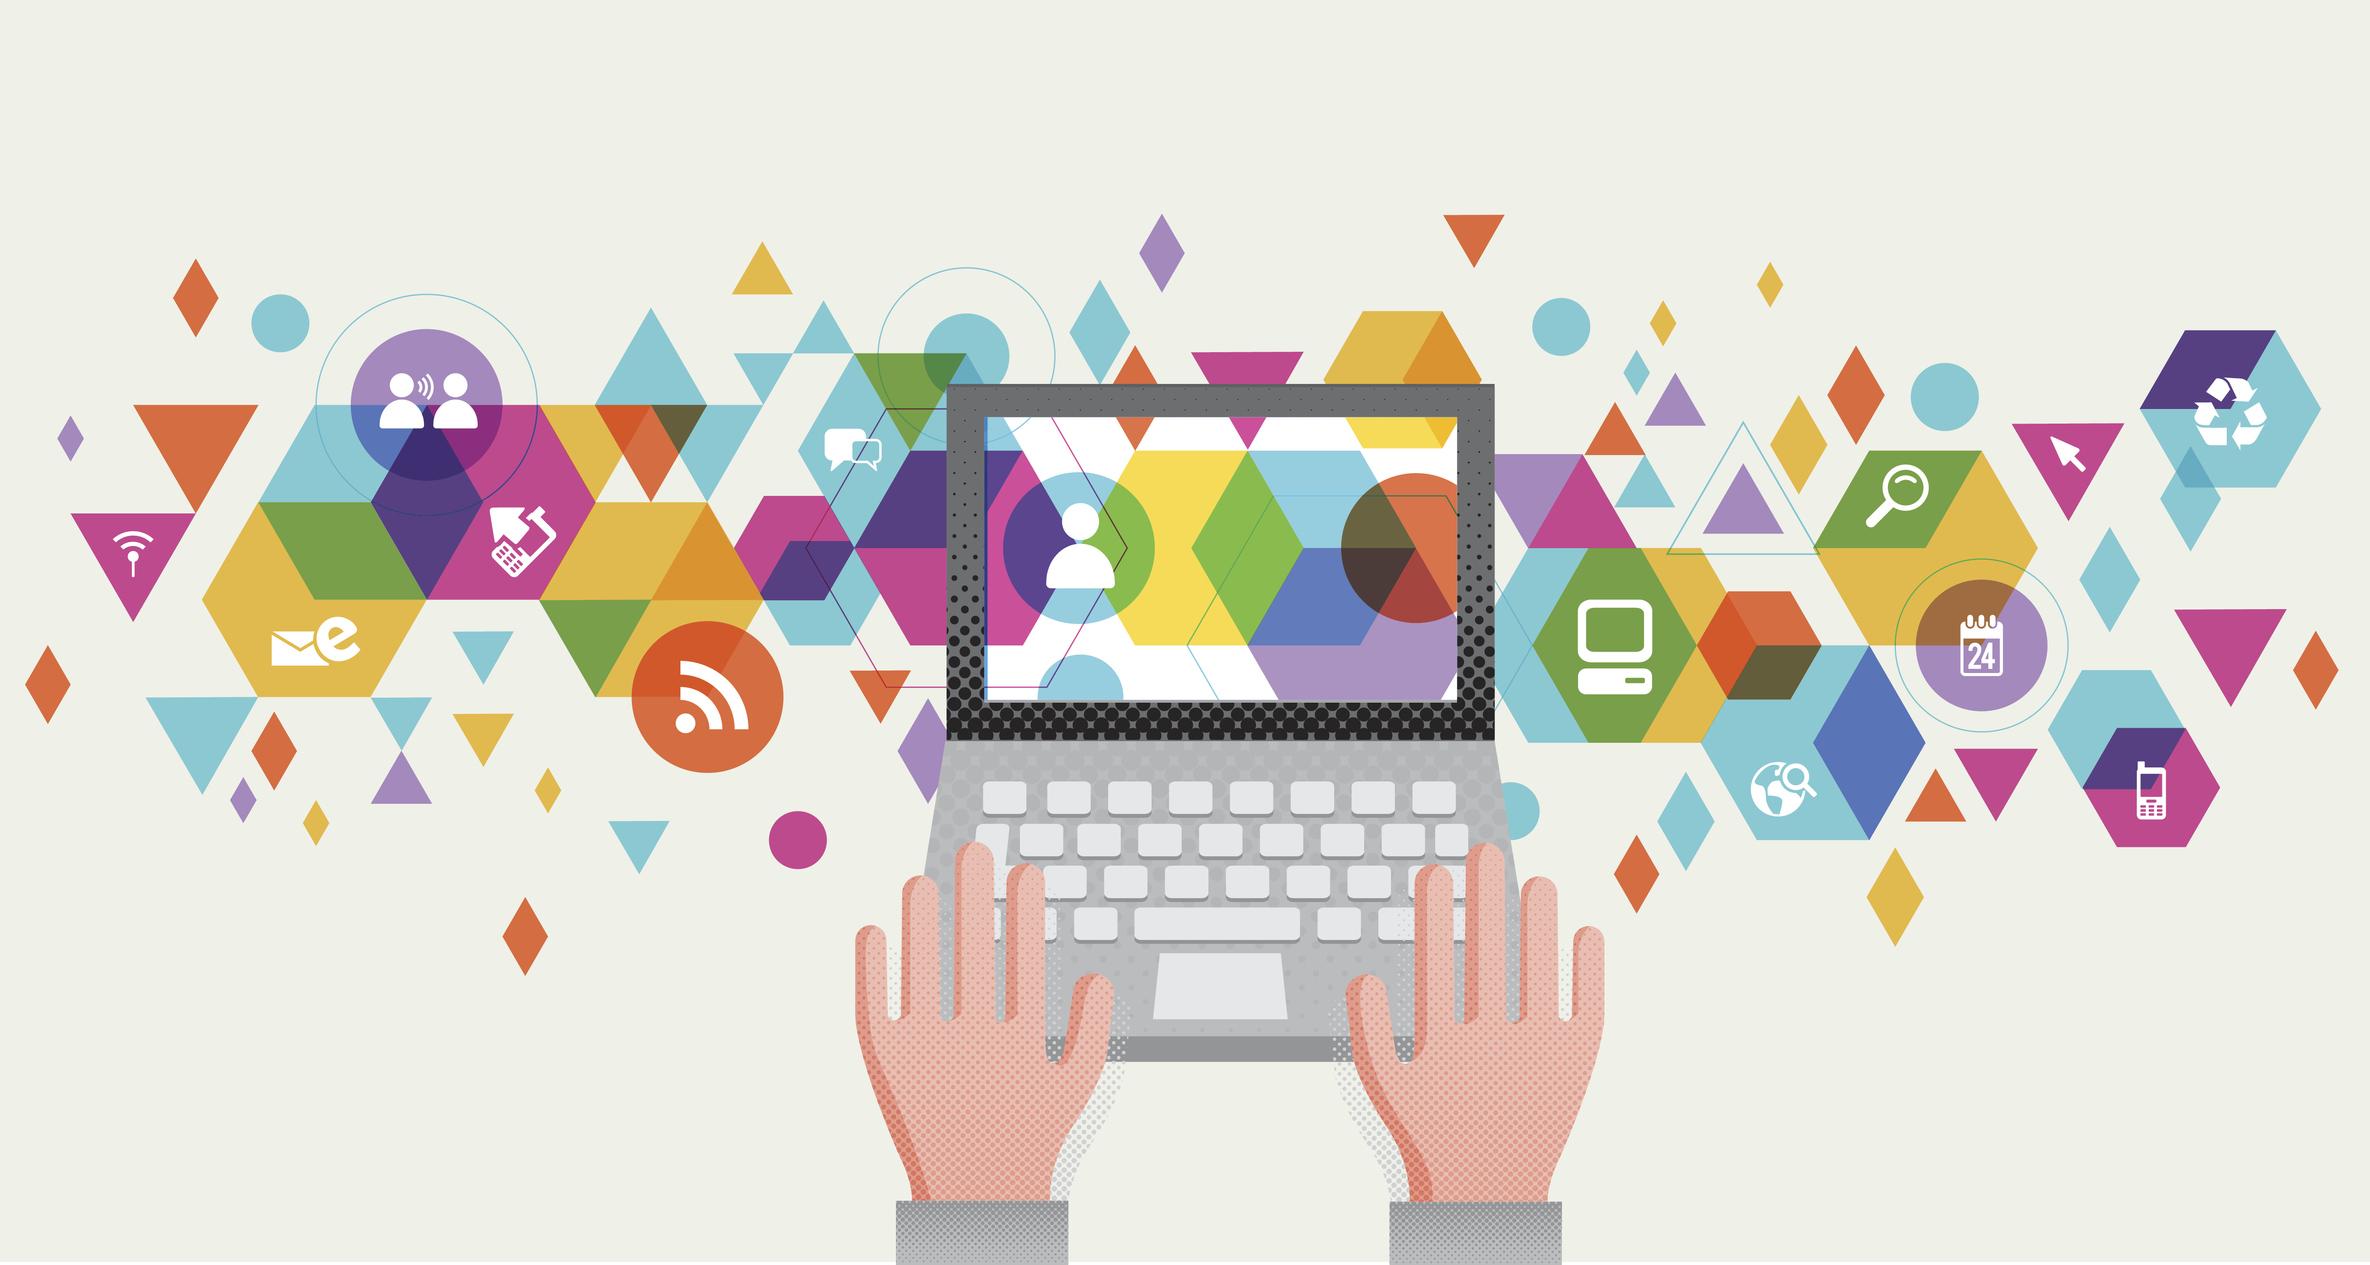 abstract illustration of computer social media